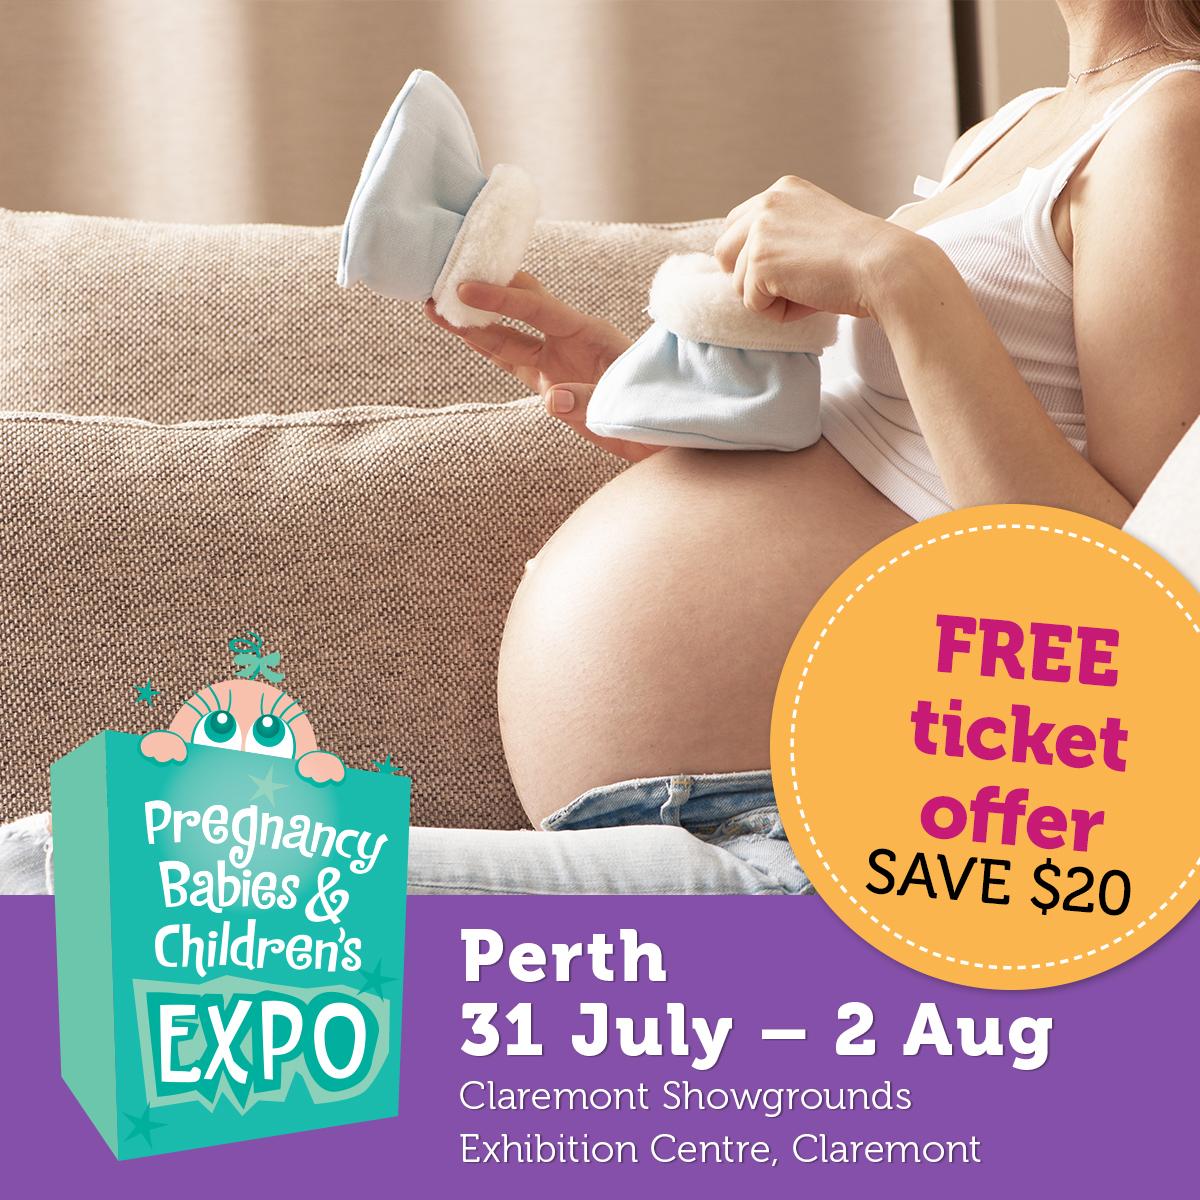 Perth2016_Instagram_FreeTicketOffer